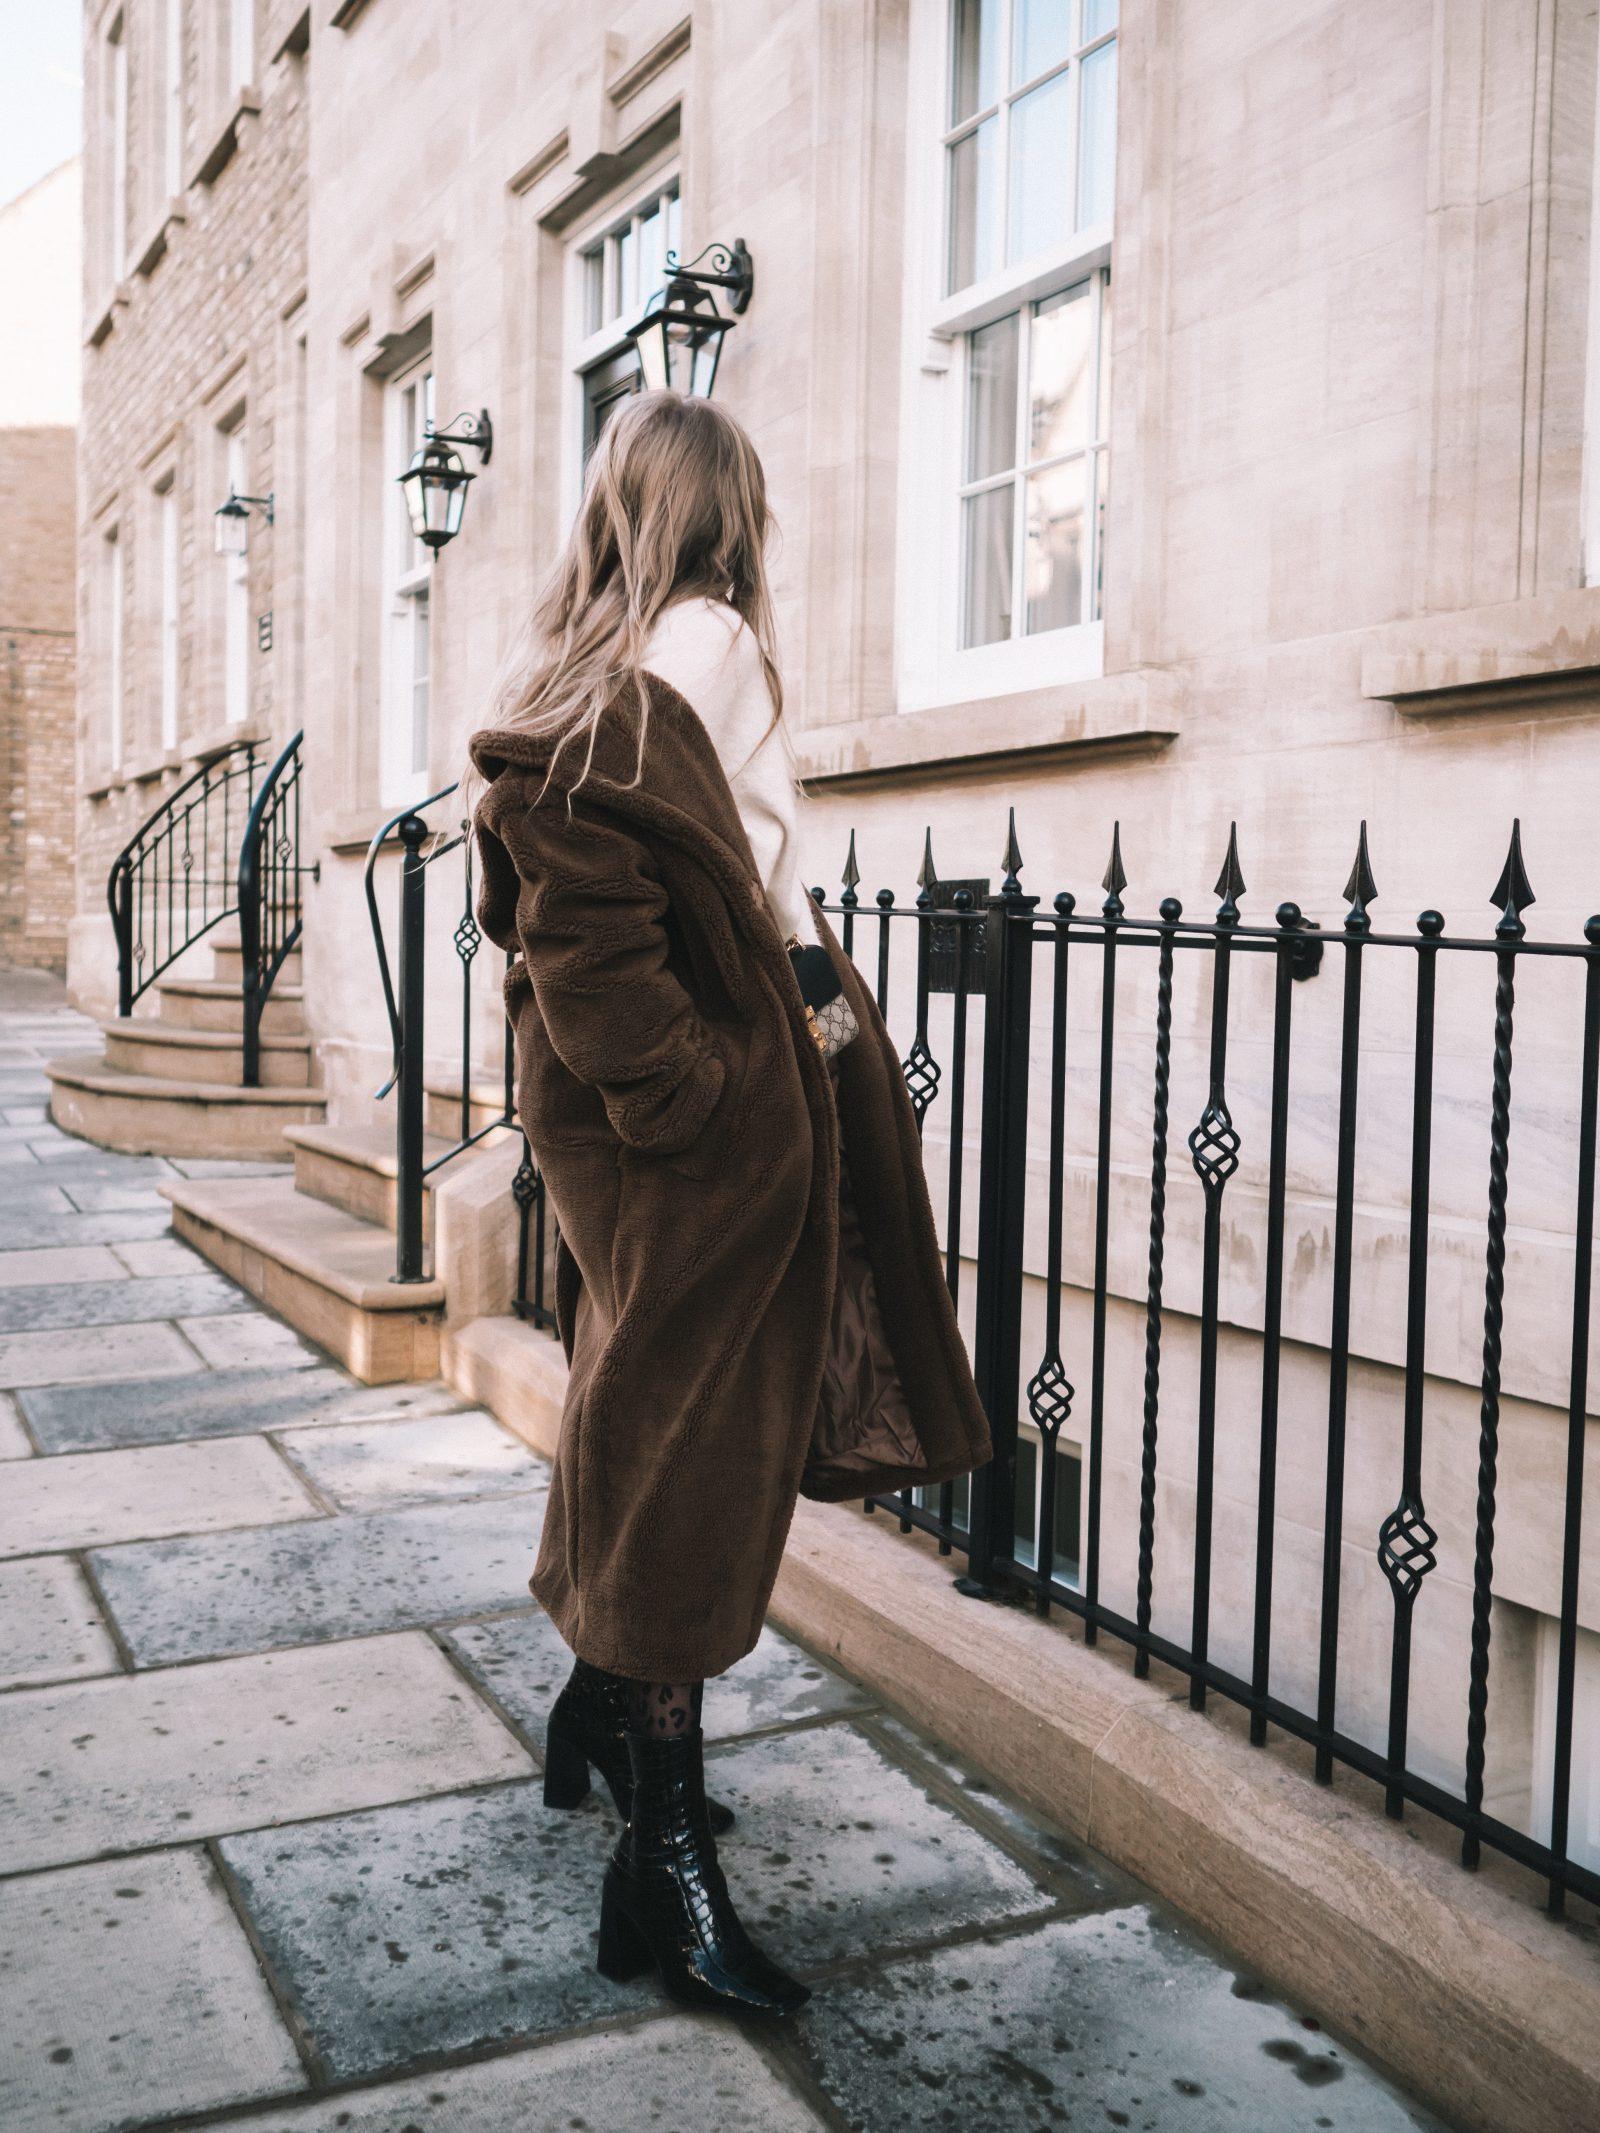 Warmest Coat - Brown Fur Coat - Sinead Crowe Autumn Street Style